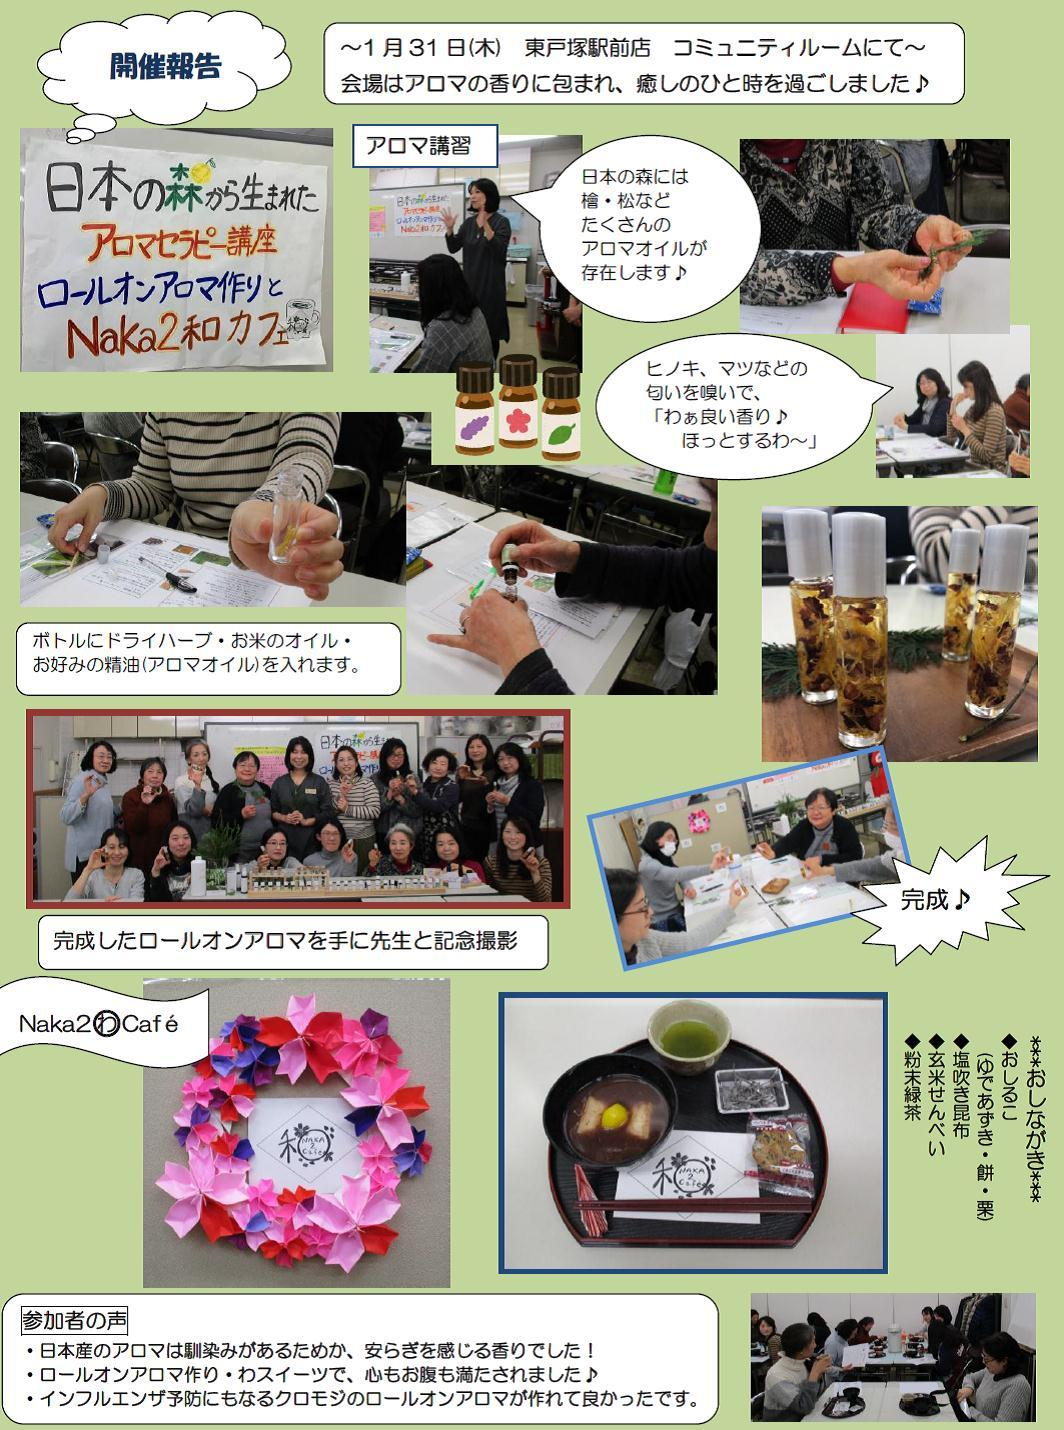 http://kanagawa.ucoop.or.jp/hiroba/areanews/files/naka2%2020190131.jpg